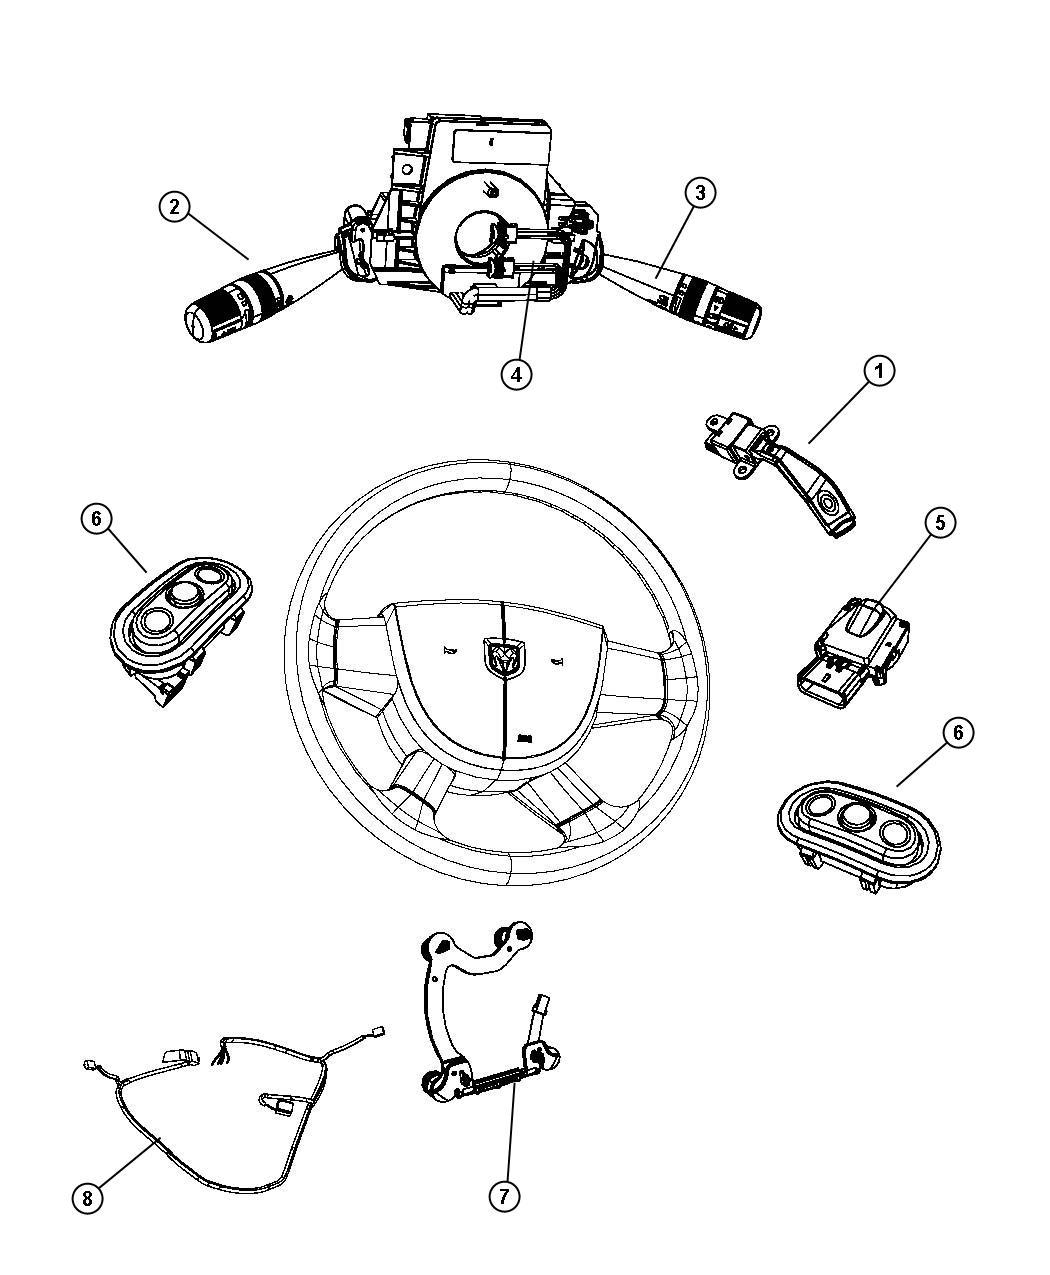 Chrysler Sebring Switch Multifunction Electronic